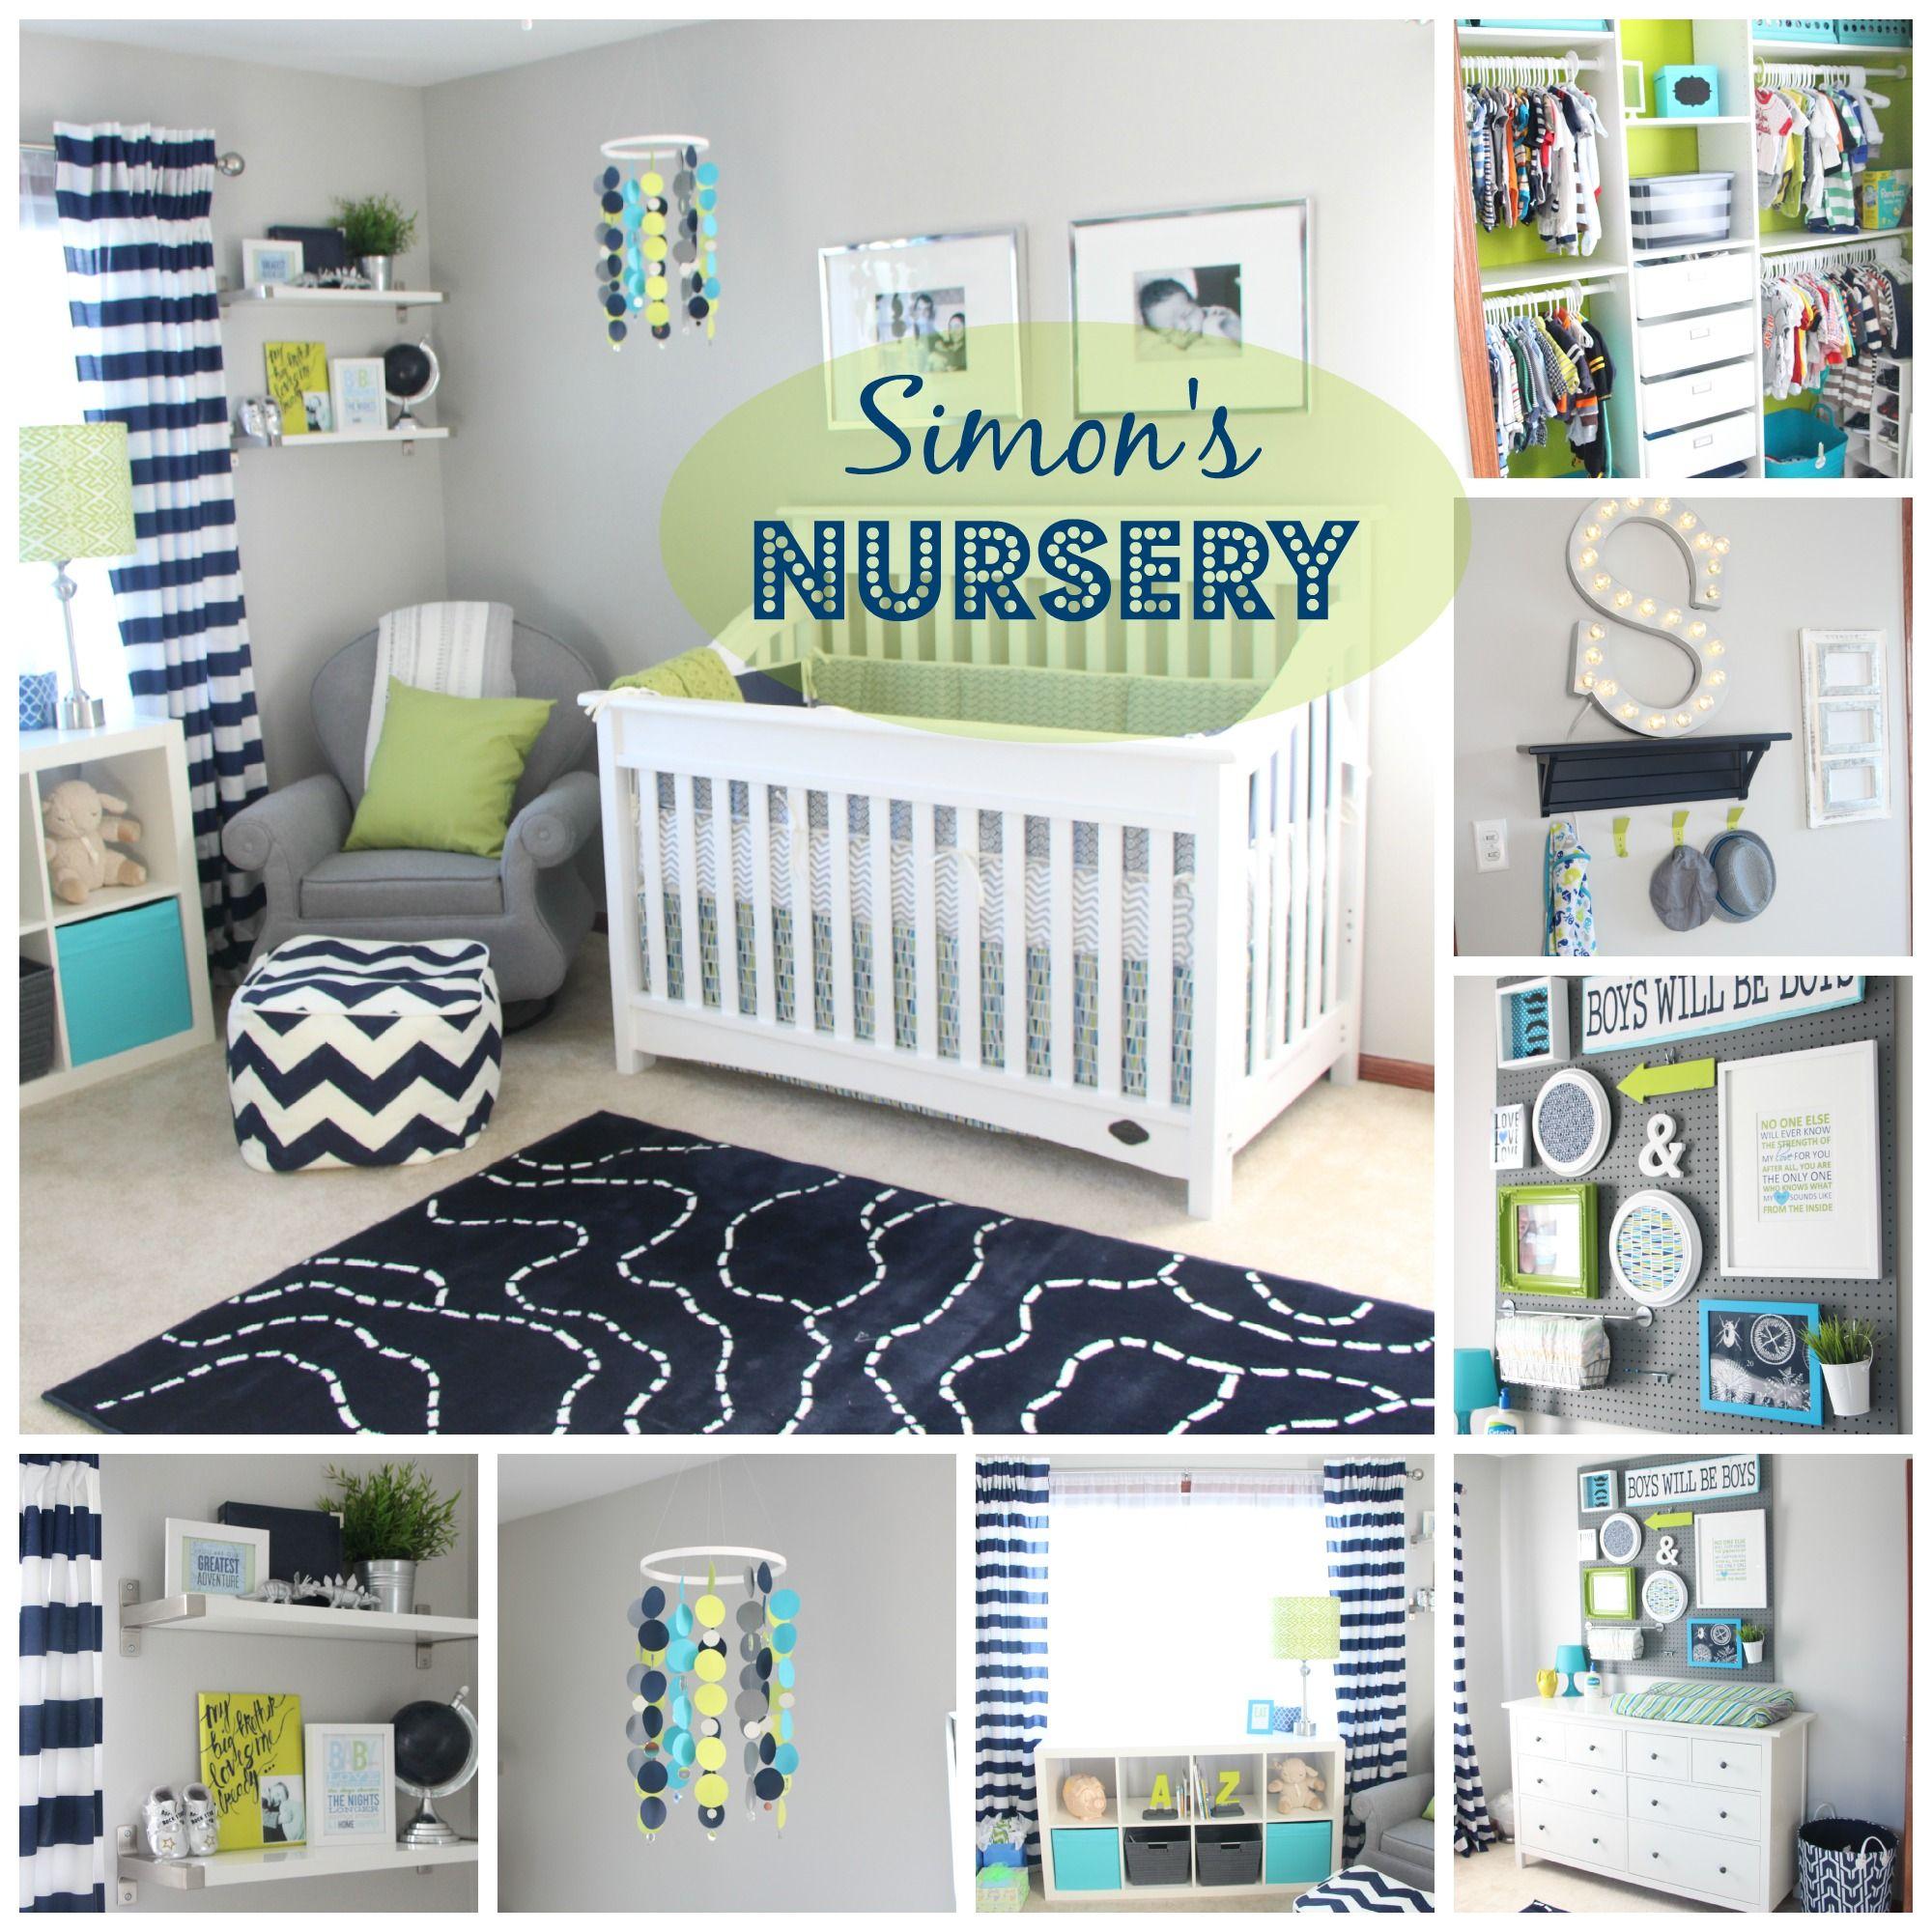 Diy boy nursery decor - Decoration Diy Nursery